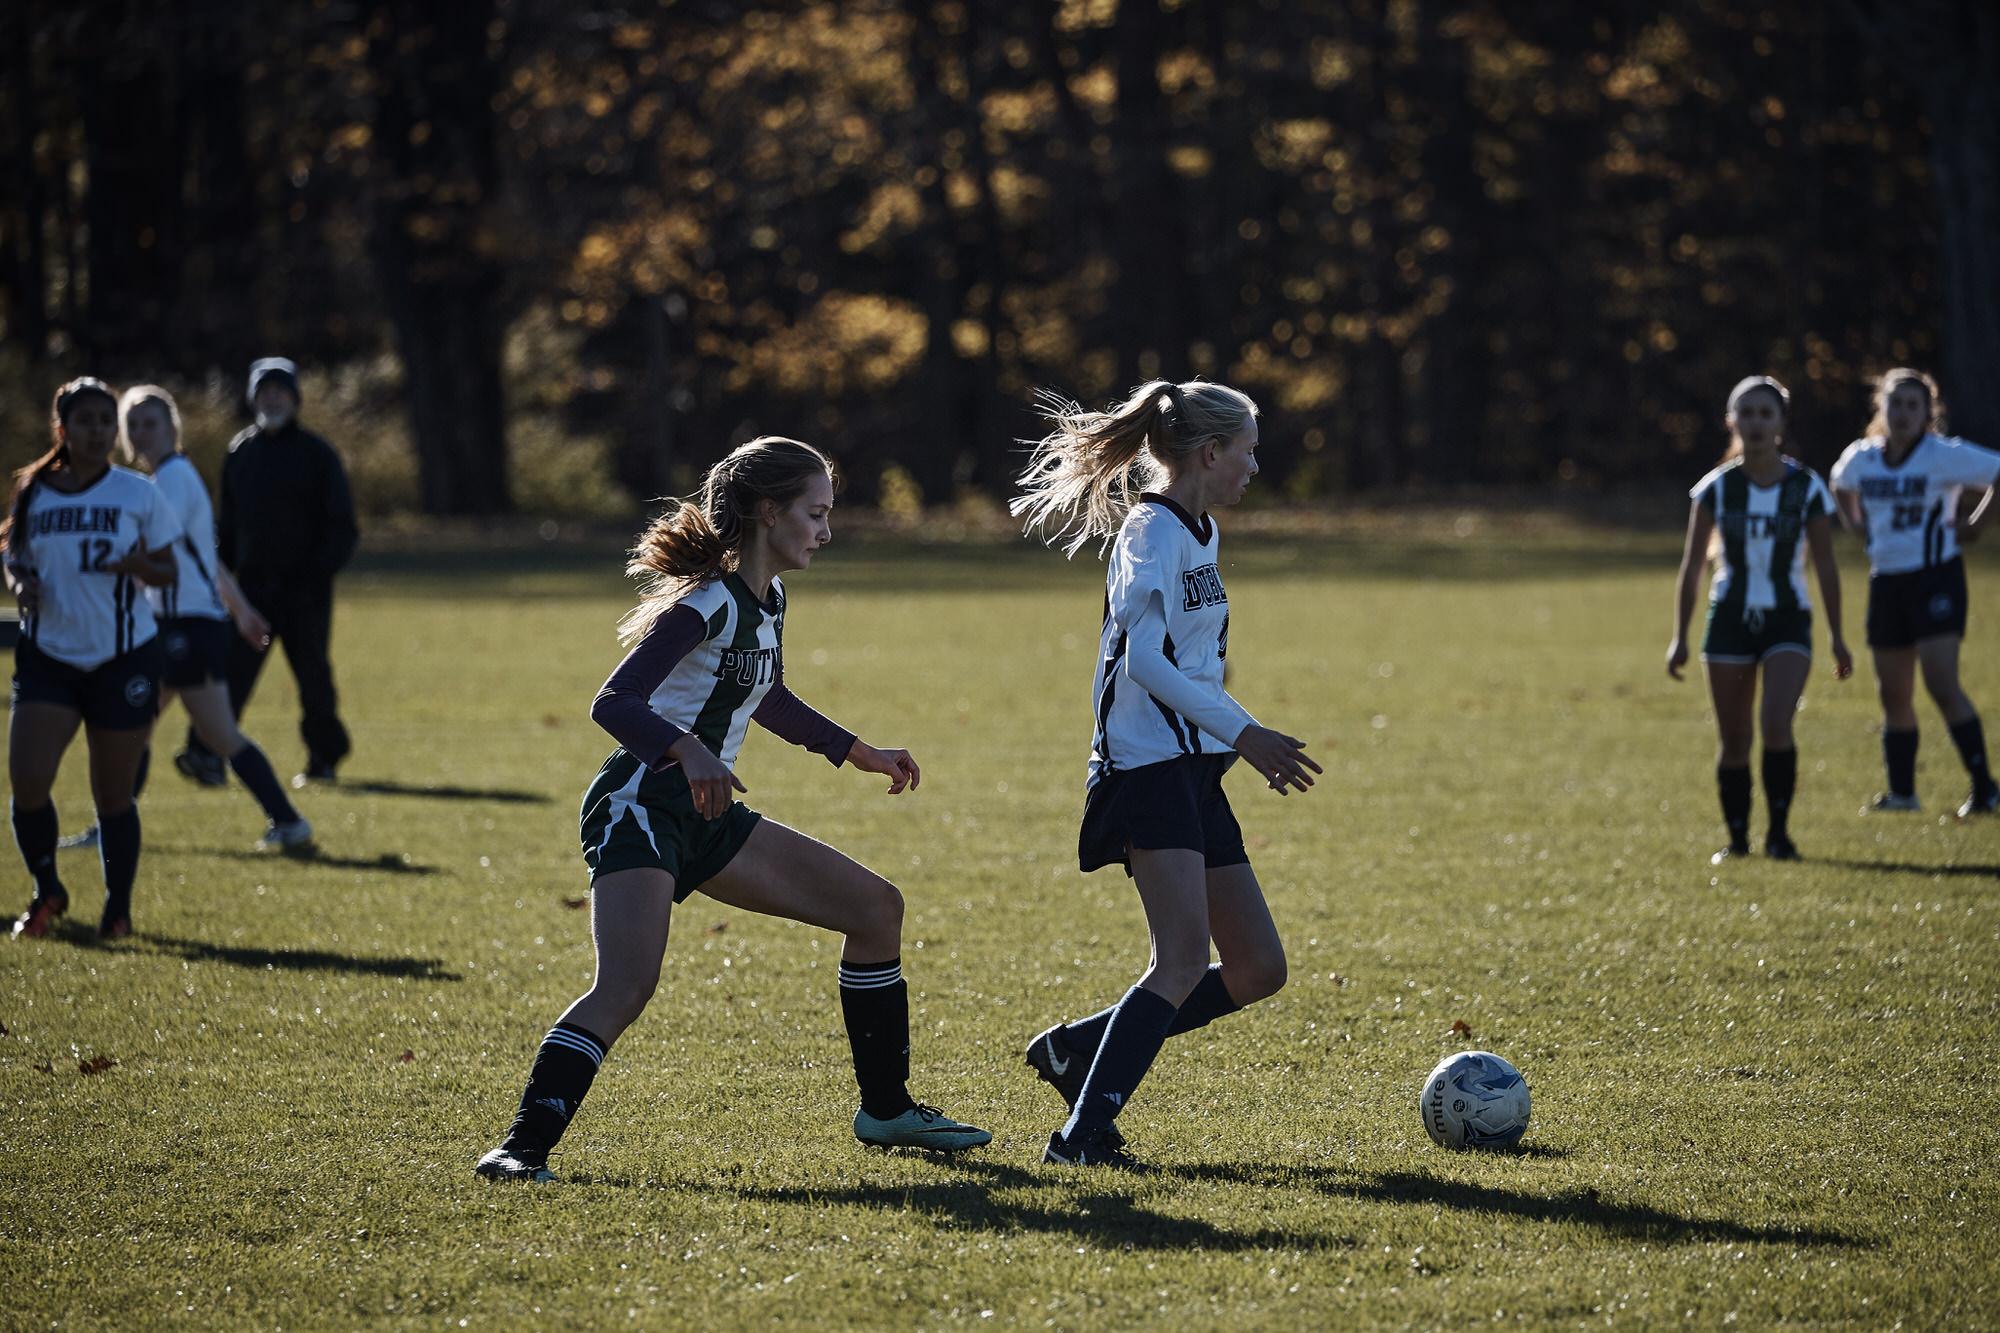 Girls Varsity Soccer vs. Putney School - October 26, 2018 - 015.jpg